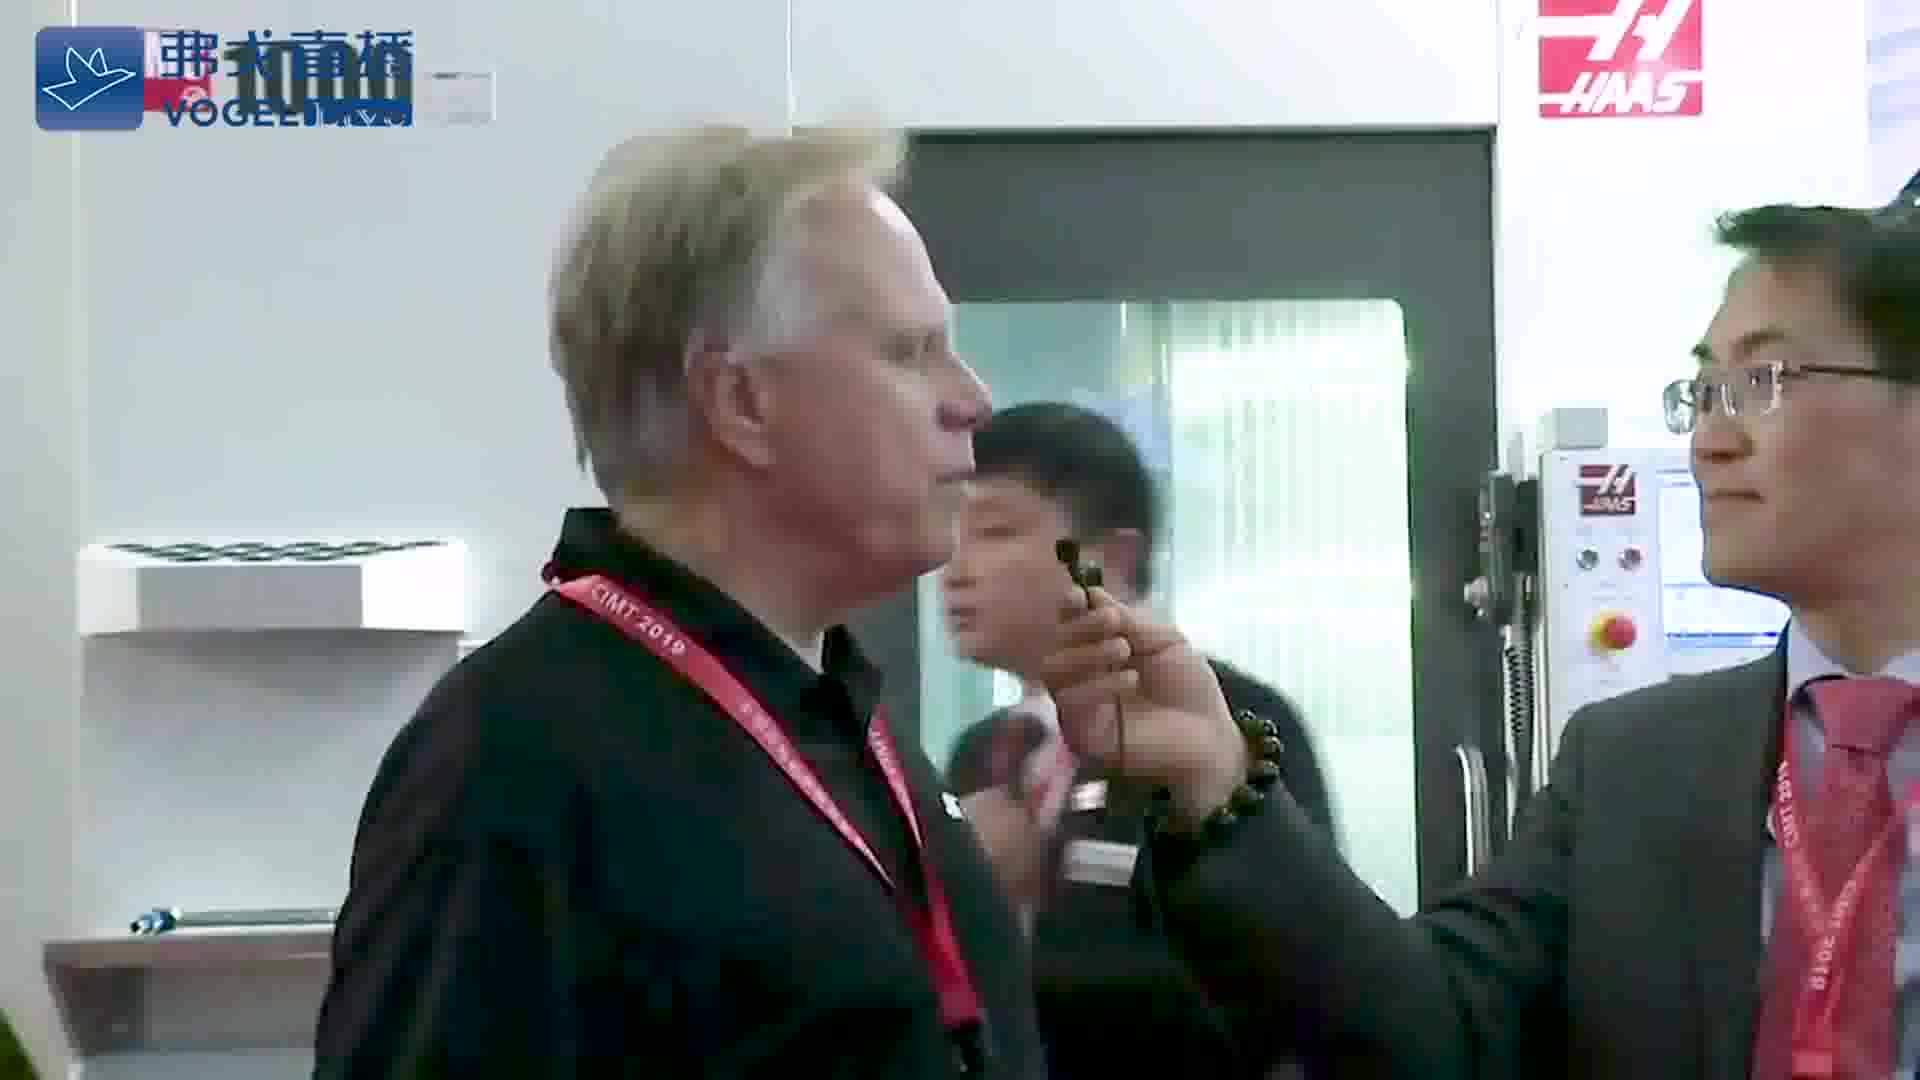 Mr. Gene Haas 哈斯自动化公司和哈斯F1车队创始人-CIMT2019